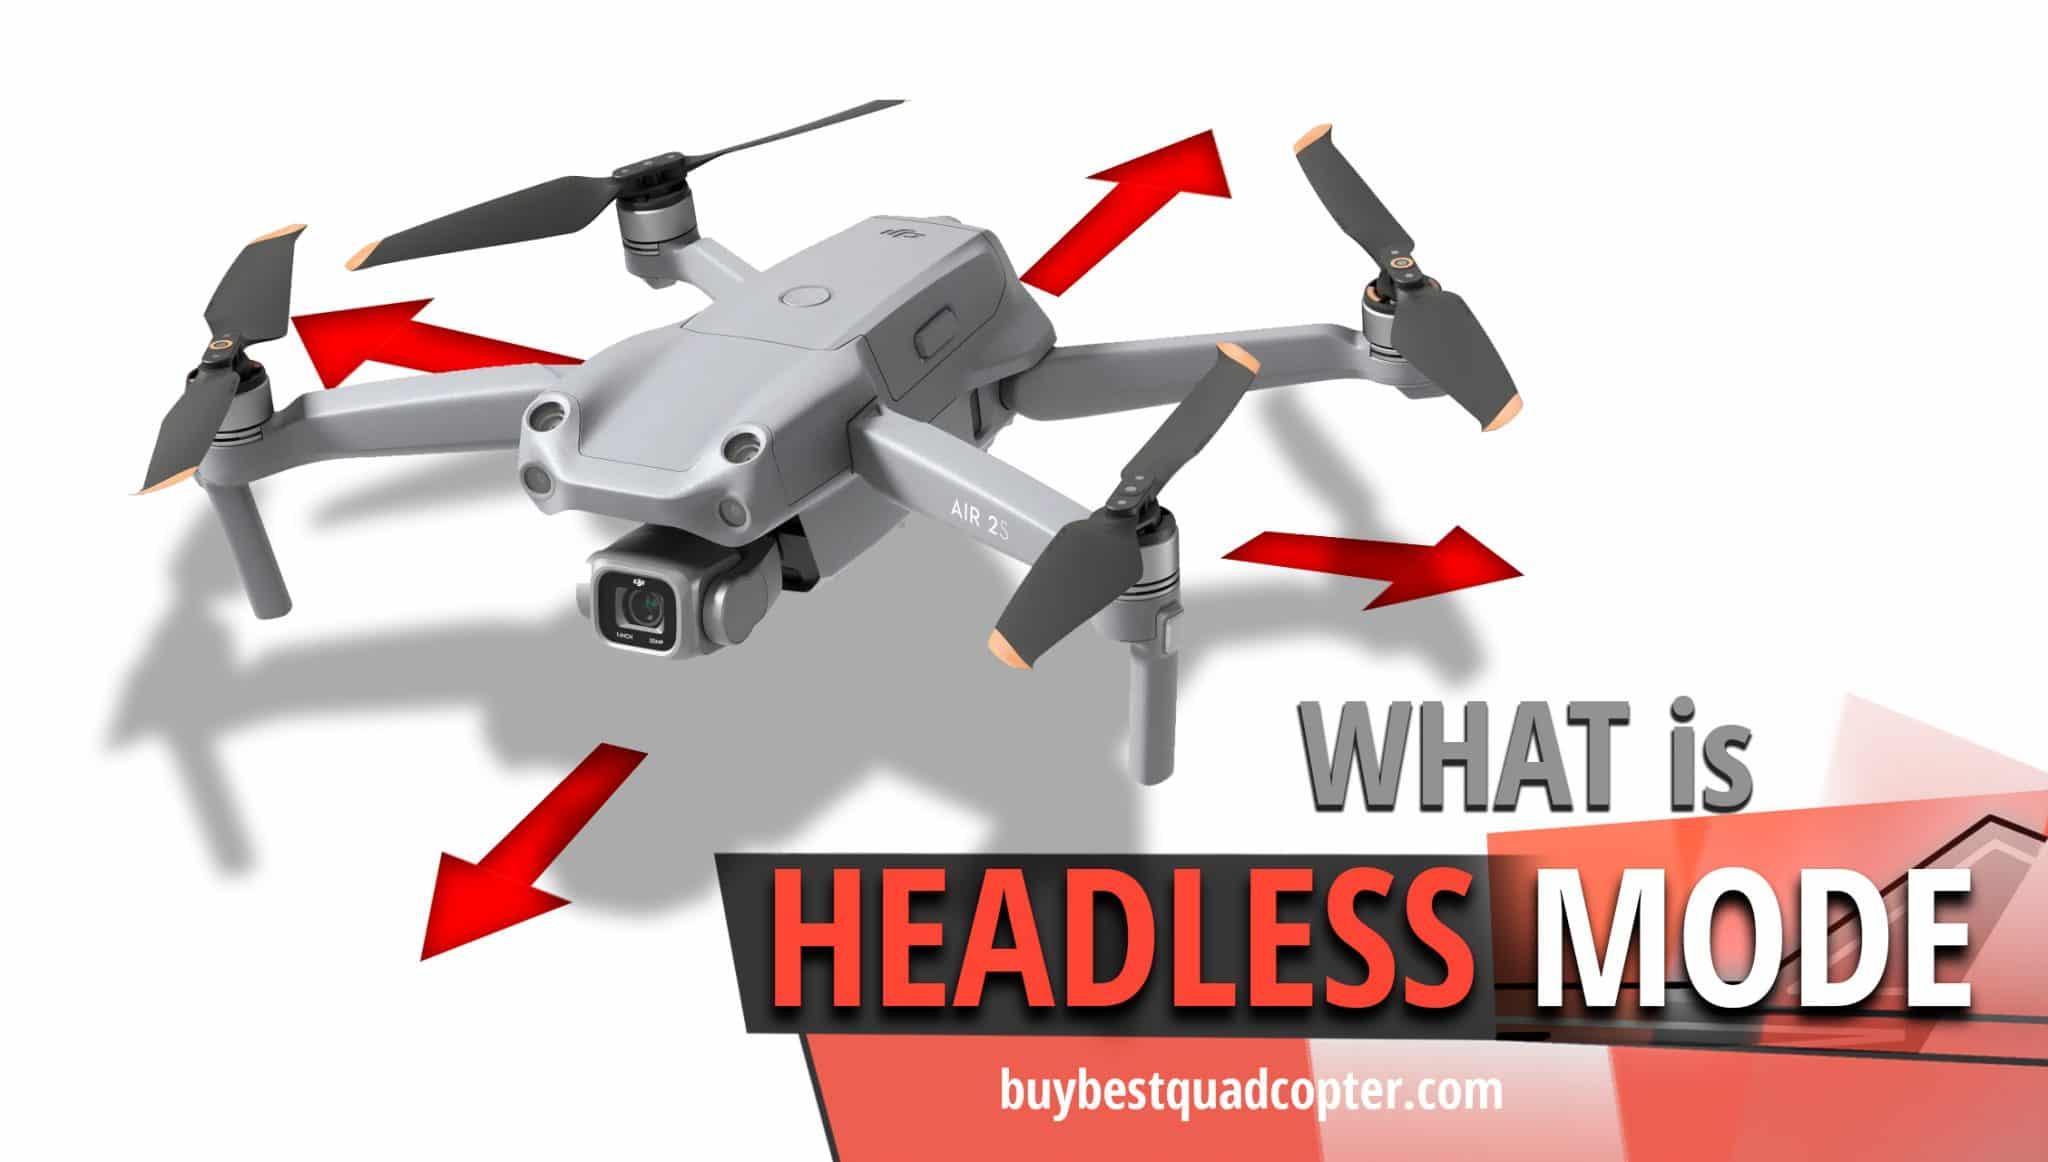 HEADLESS MODE on drone